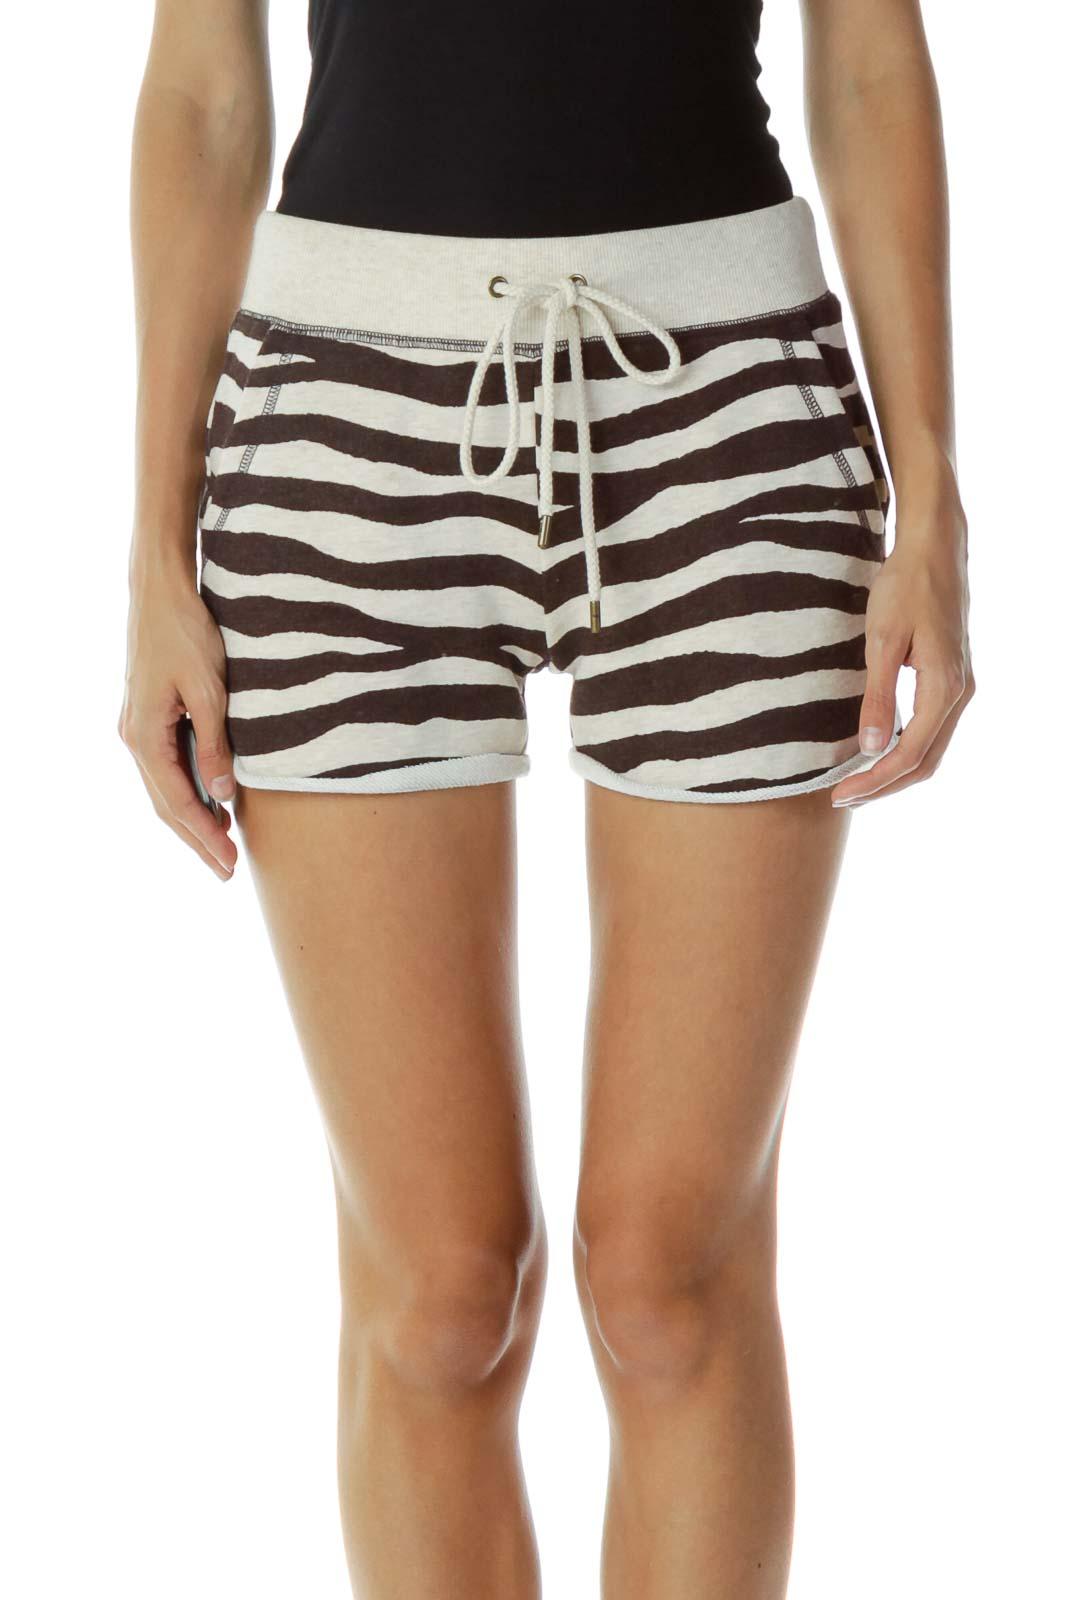 Brown Beige Striped  Drawstring Shorts